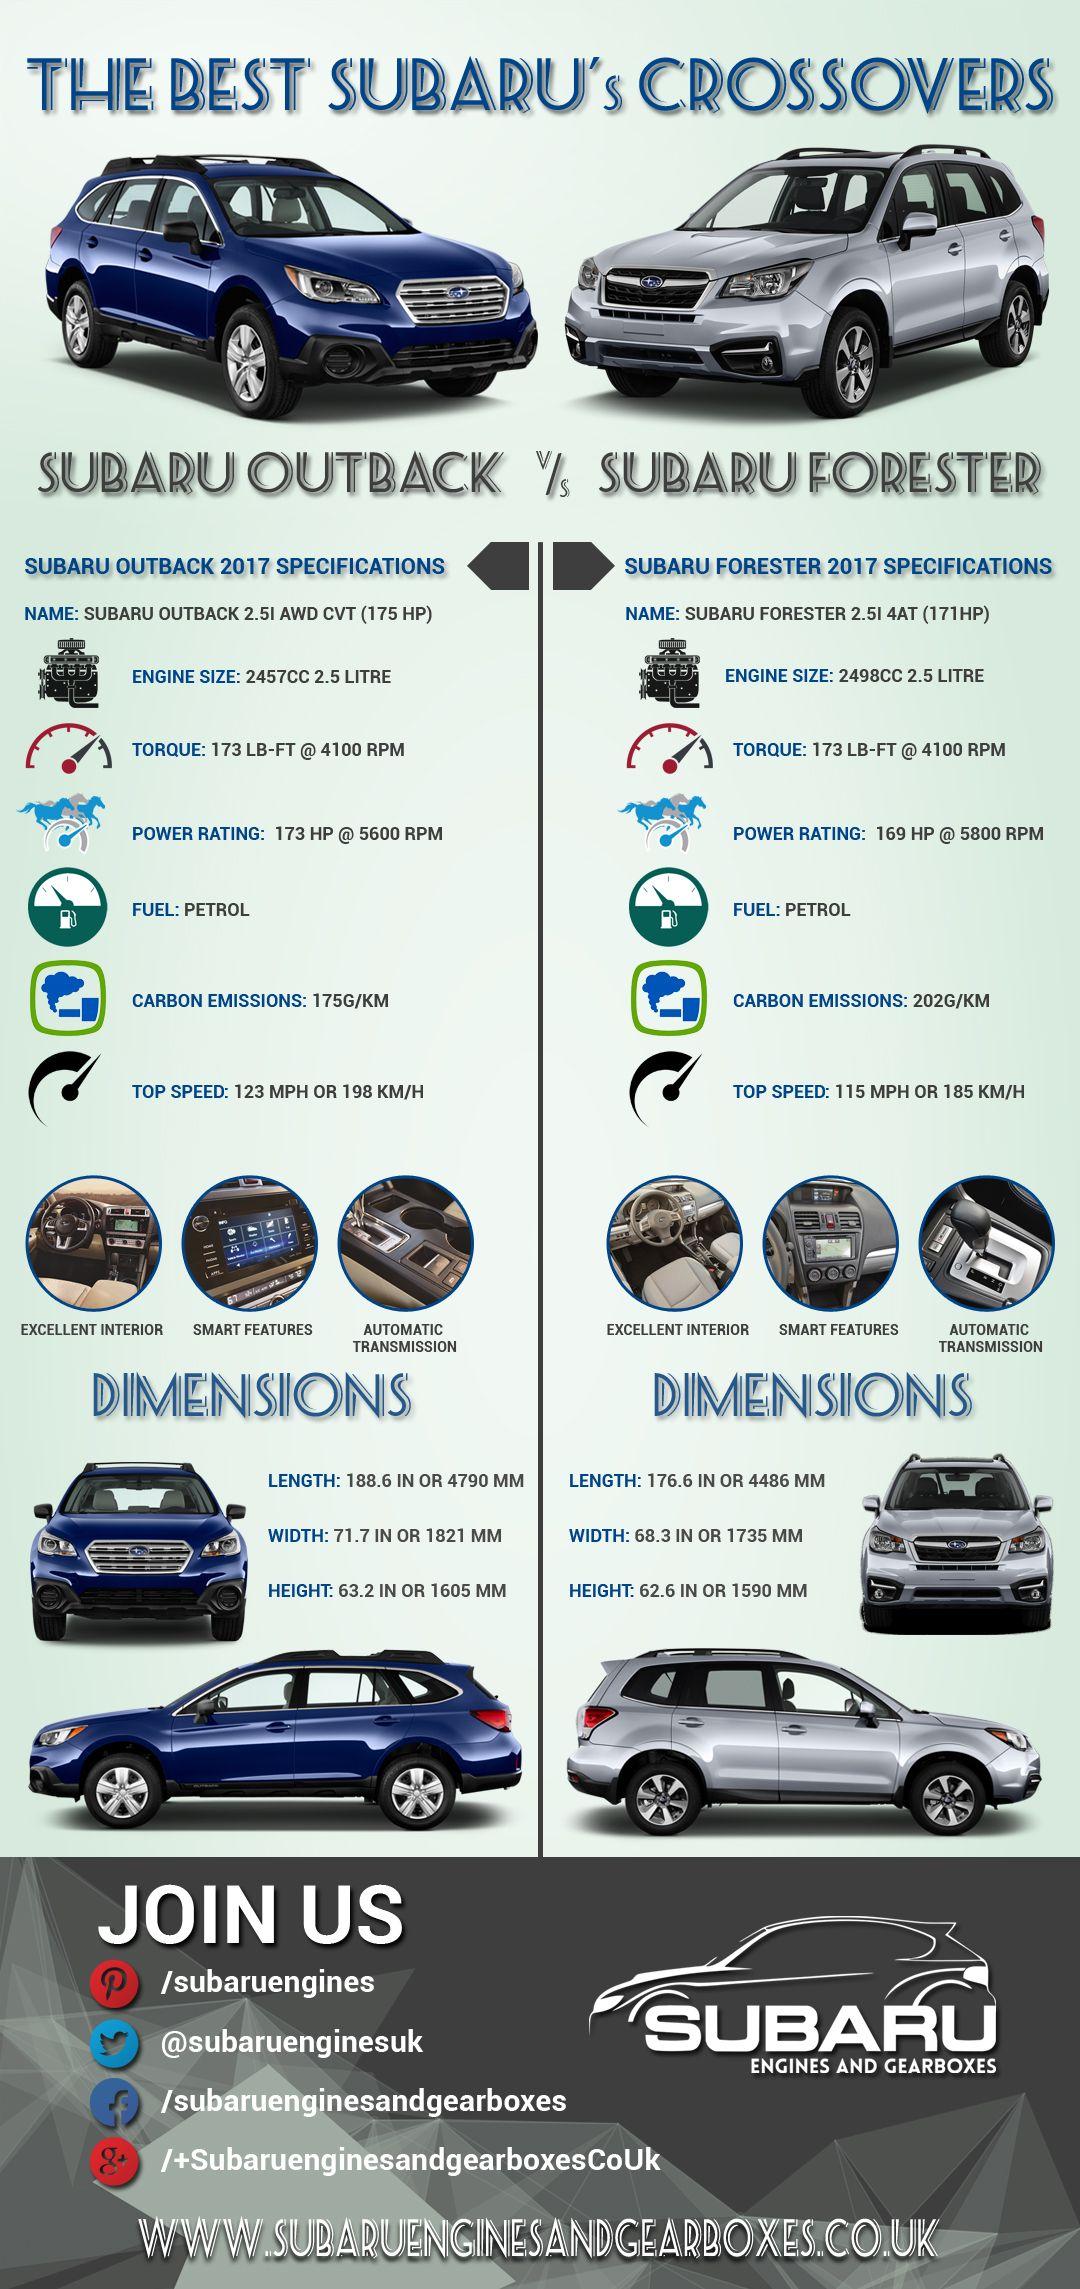 Subaru Forester vs Subaru Outback The Best Subaru s Crossovers